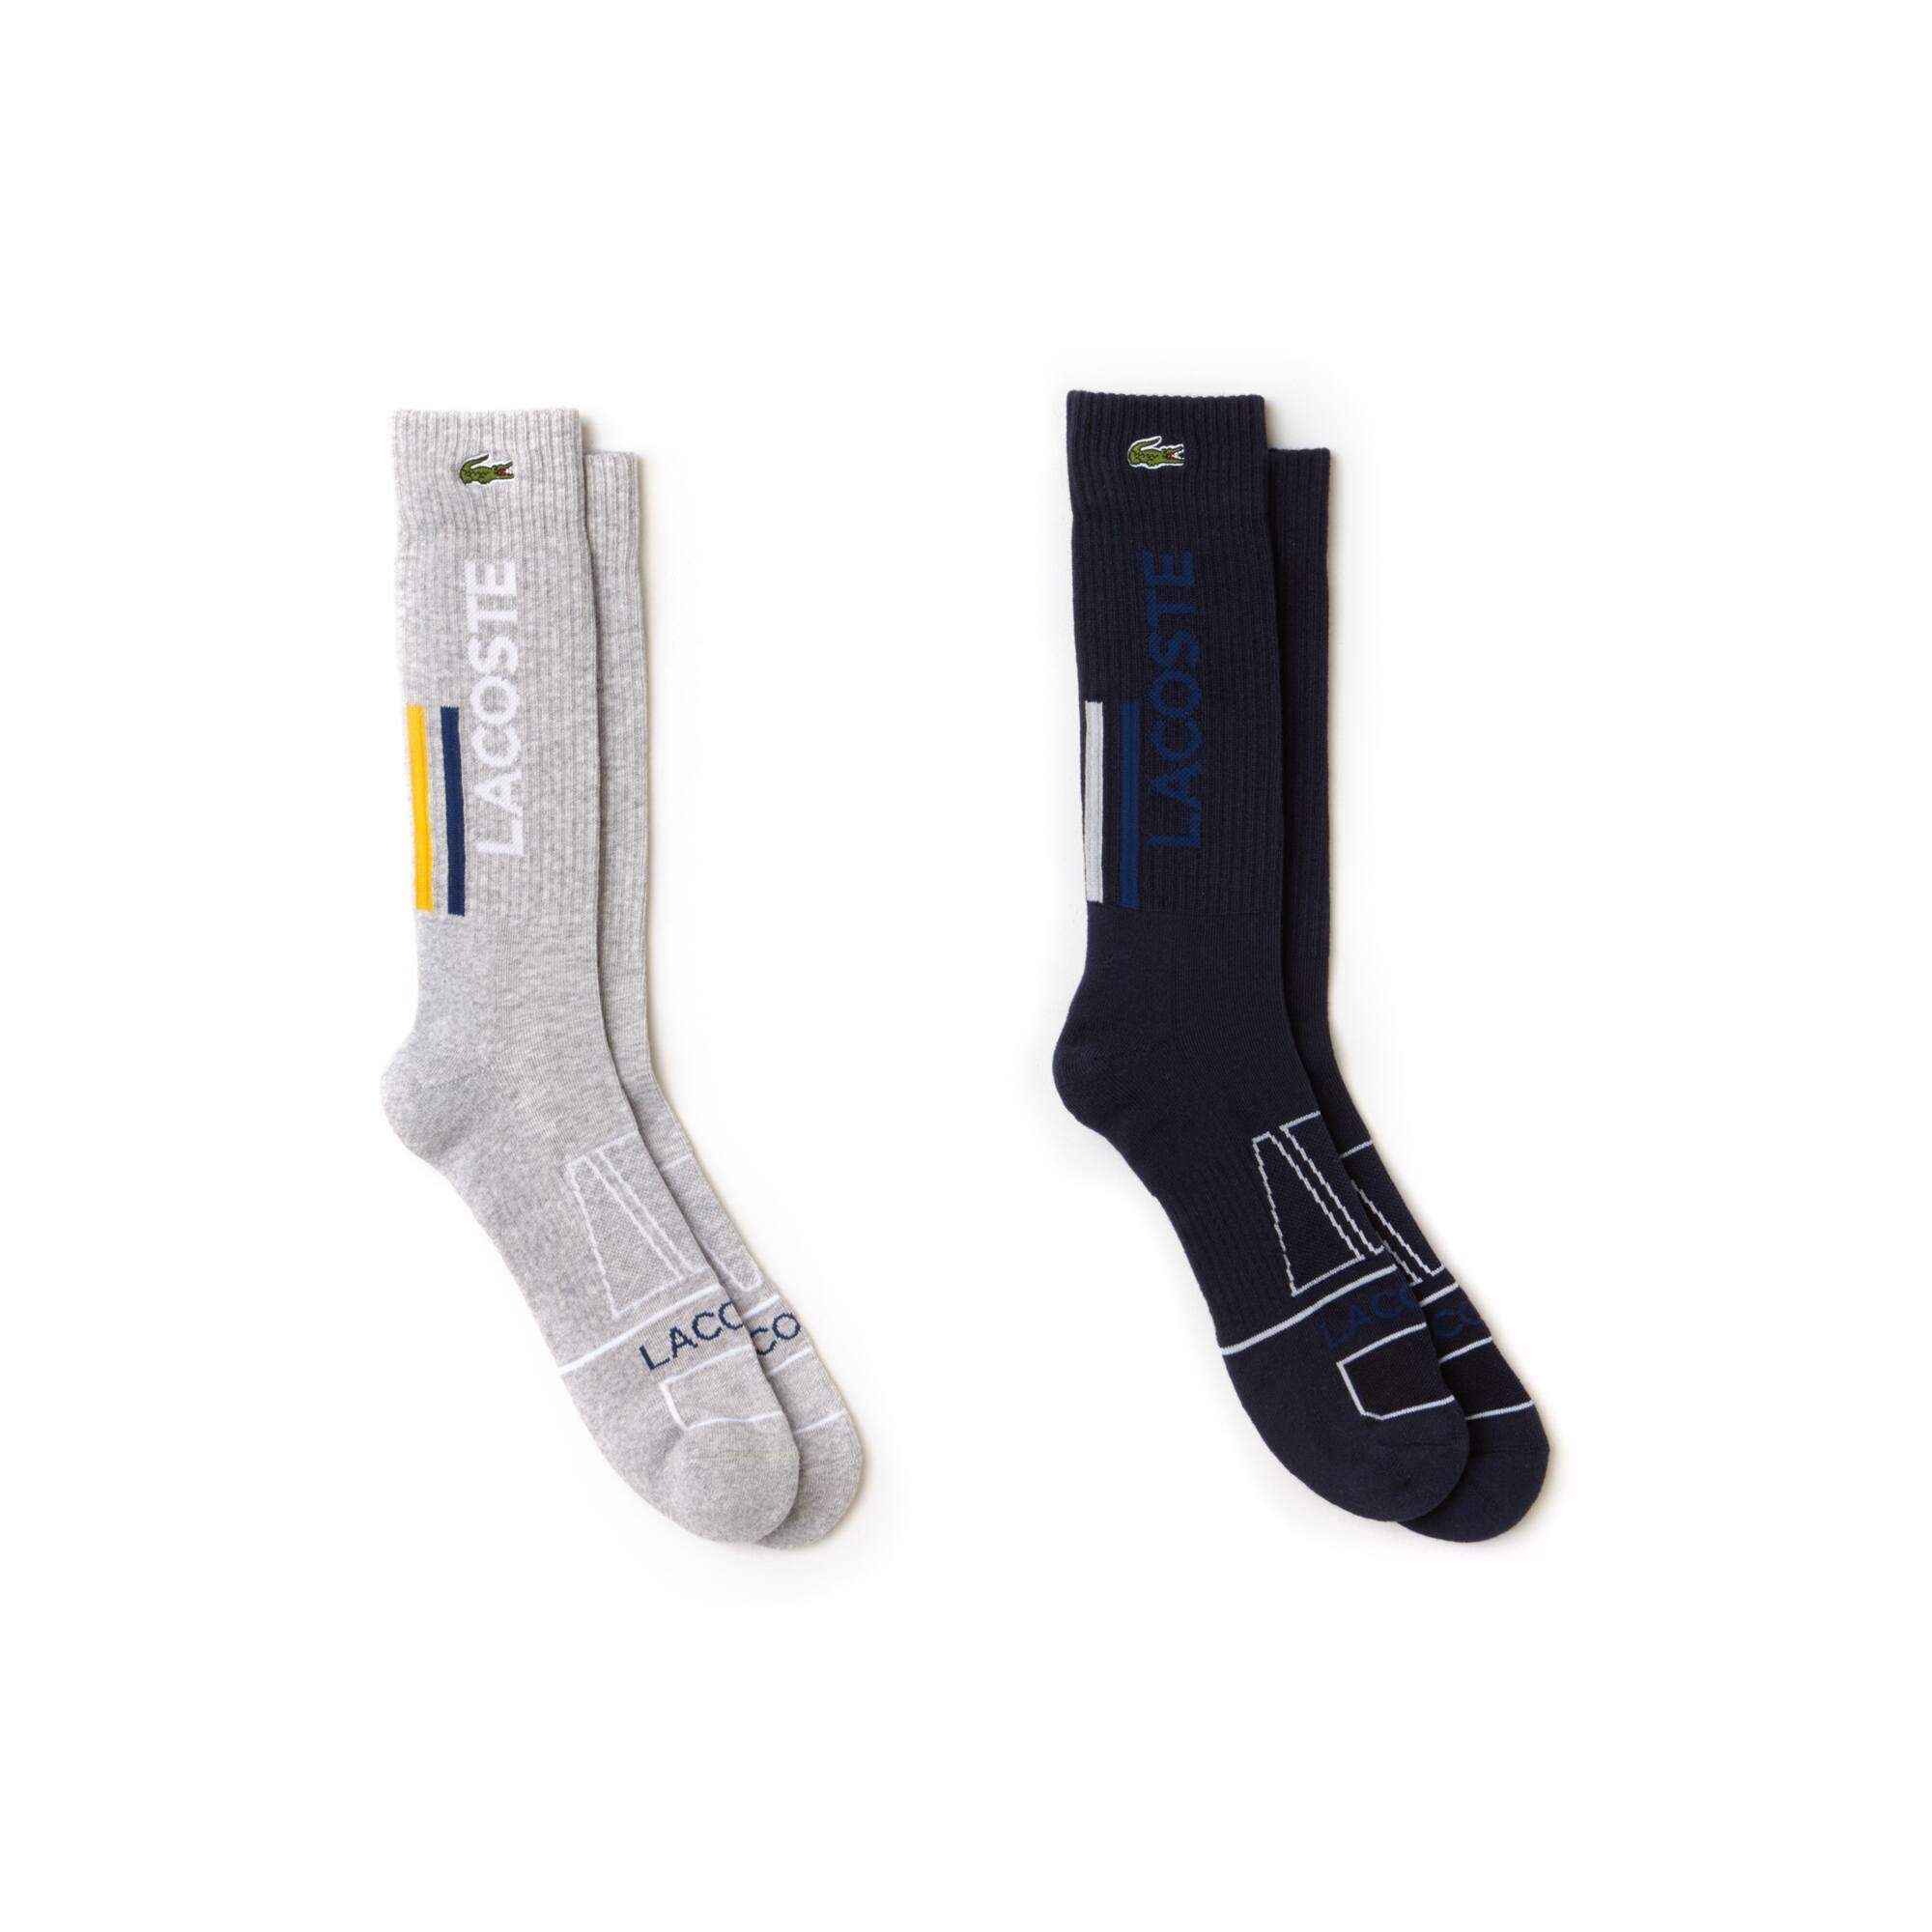 Lacoste SPORT Tennis-sokken heren jersey met stretch en letters